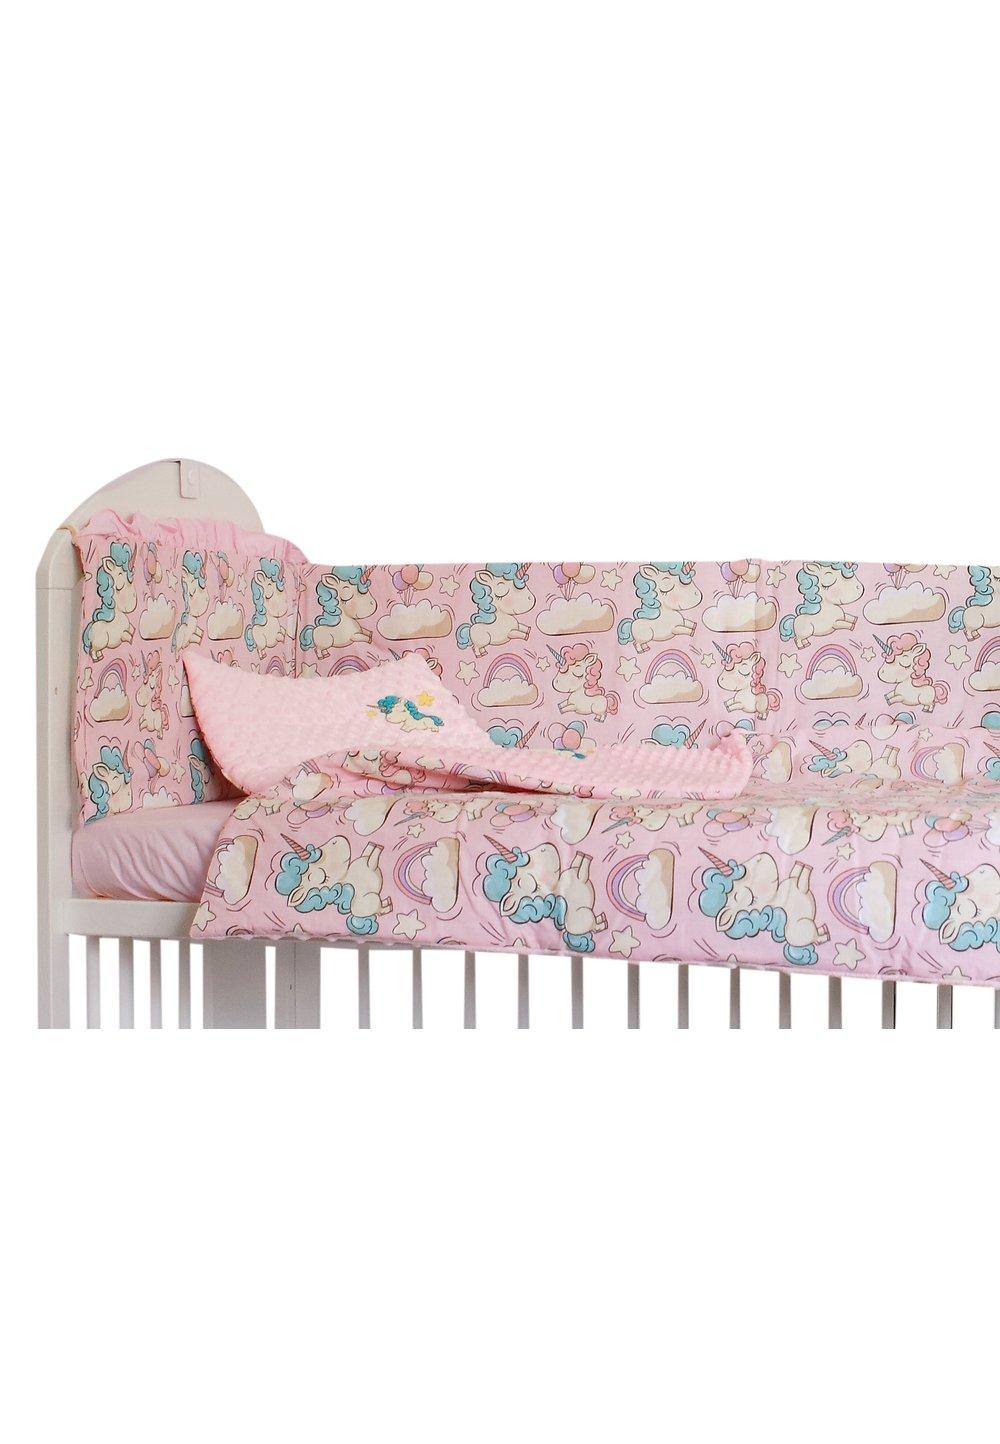 Lenjerie 5 piese, Unicorn roz, 120 x 60 cm imagine